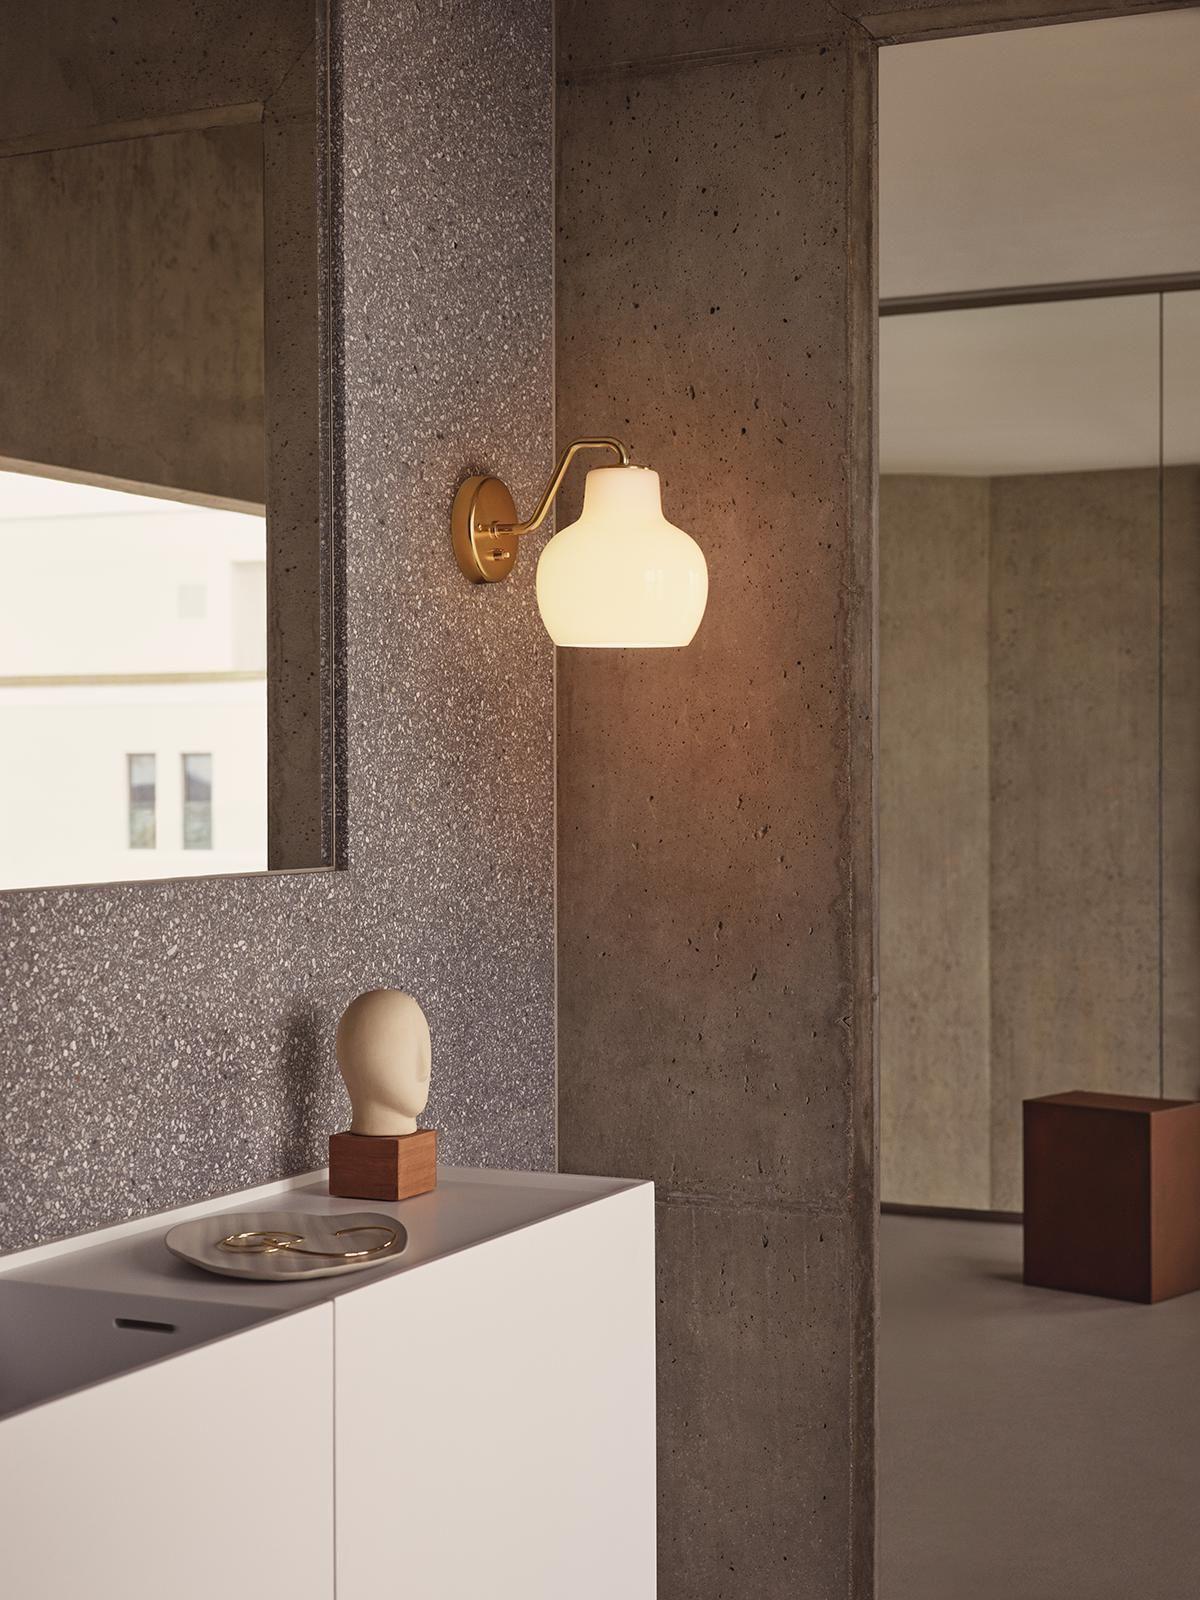 Origina Vintage Vilhelm Lauritzen Wall Lamp In 2020 Wall Lamp Louis Poulsen Crown Ring